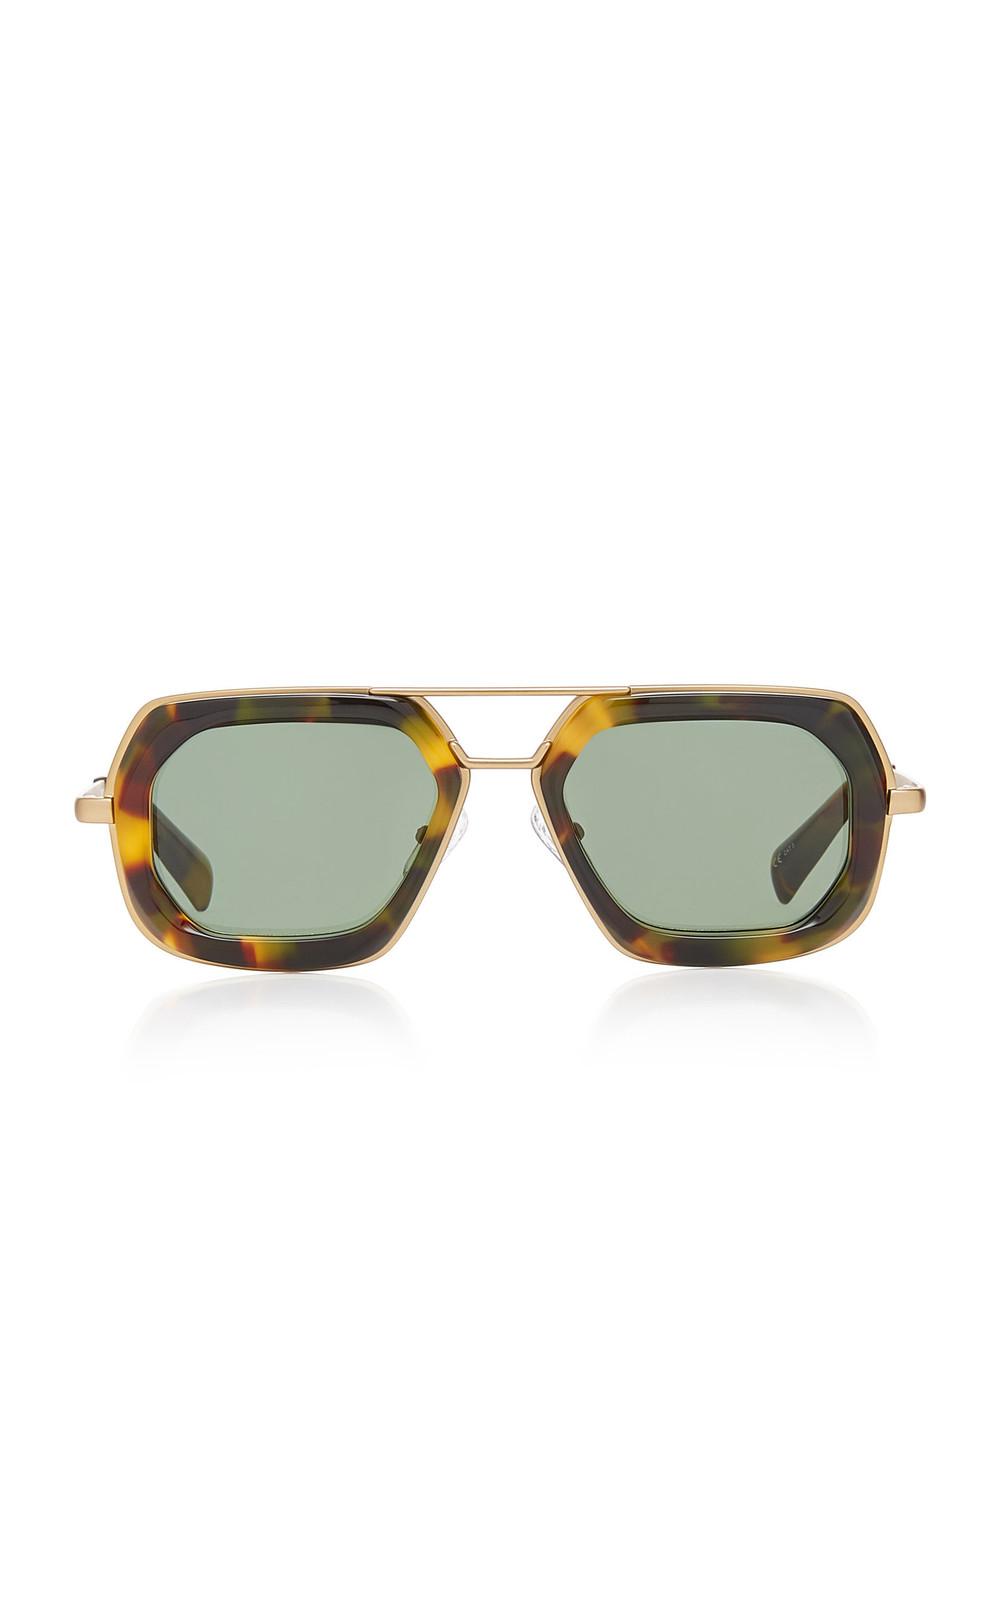 Dries Van Noten Oversized Acetate Aviator-Style Sunglasses in gold